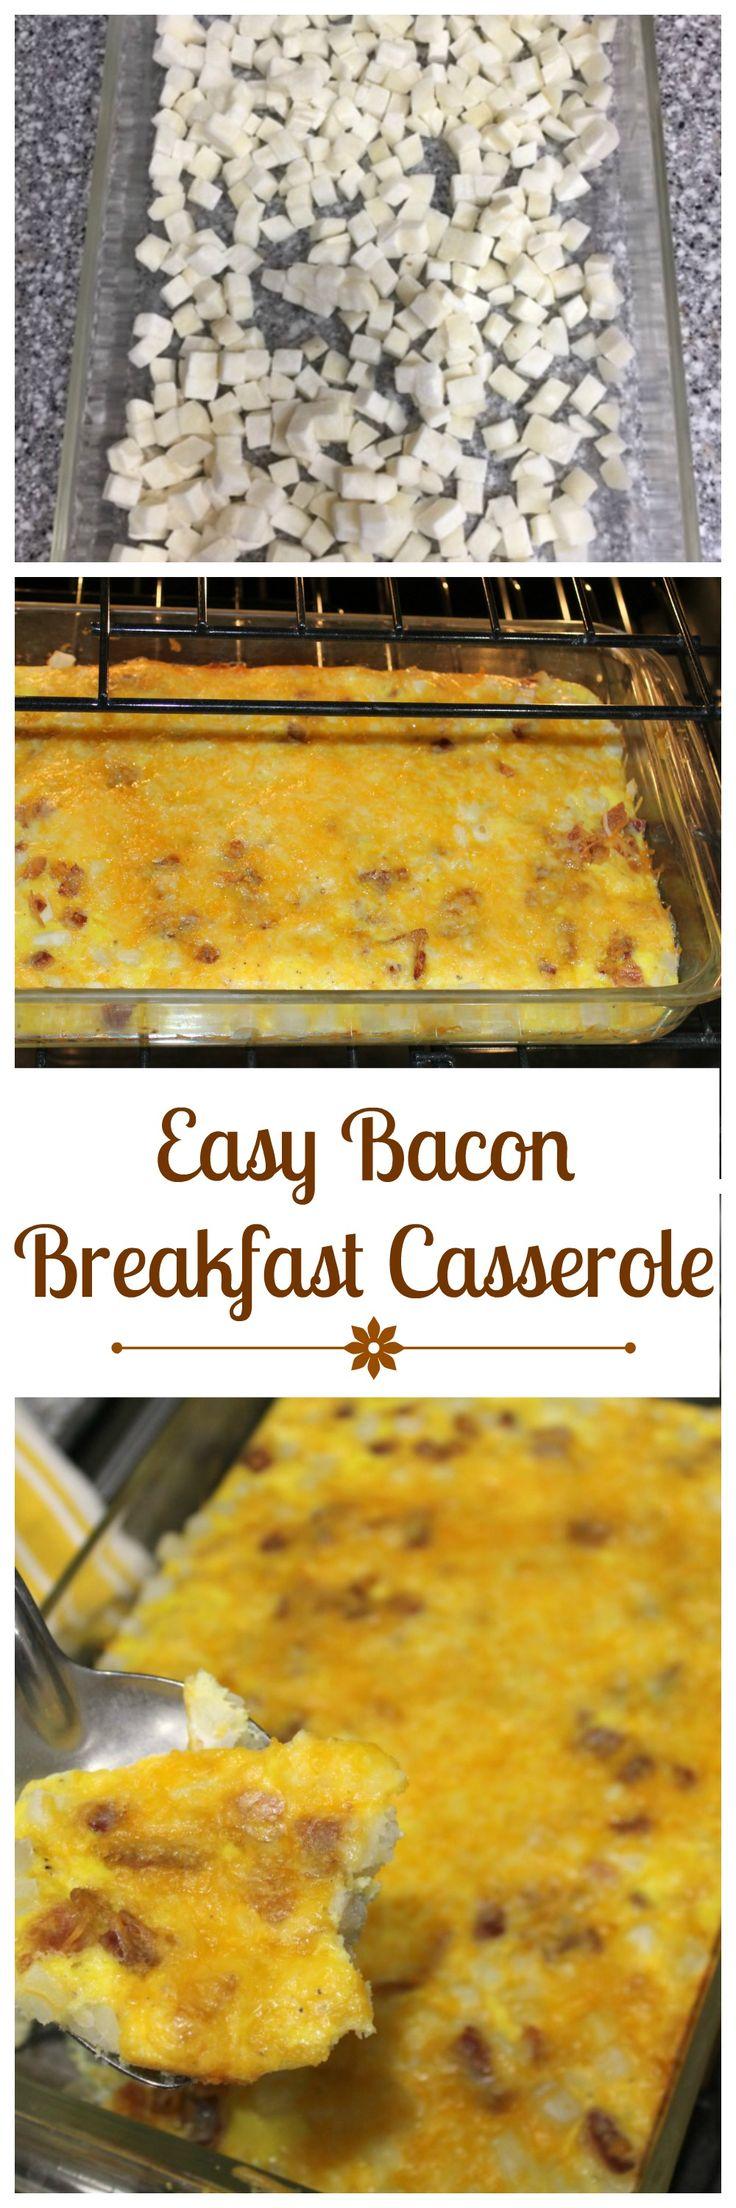 Easy Bacon Breakfast Casserole - perfect for brunch or as a make-ahead breakfast!